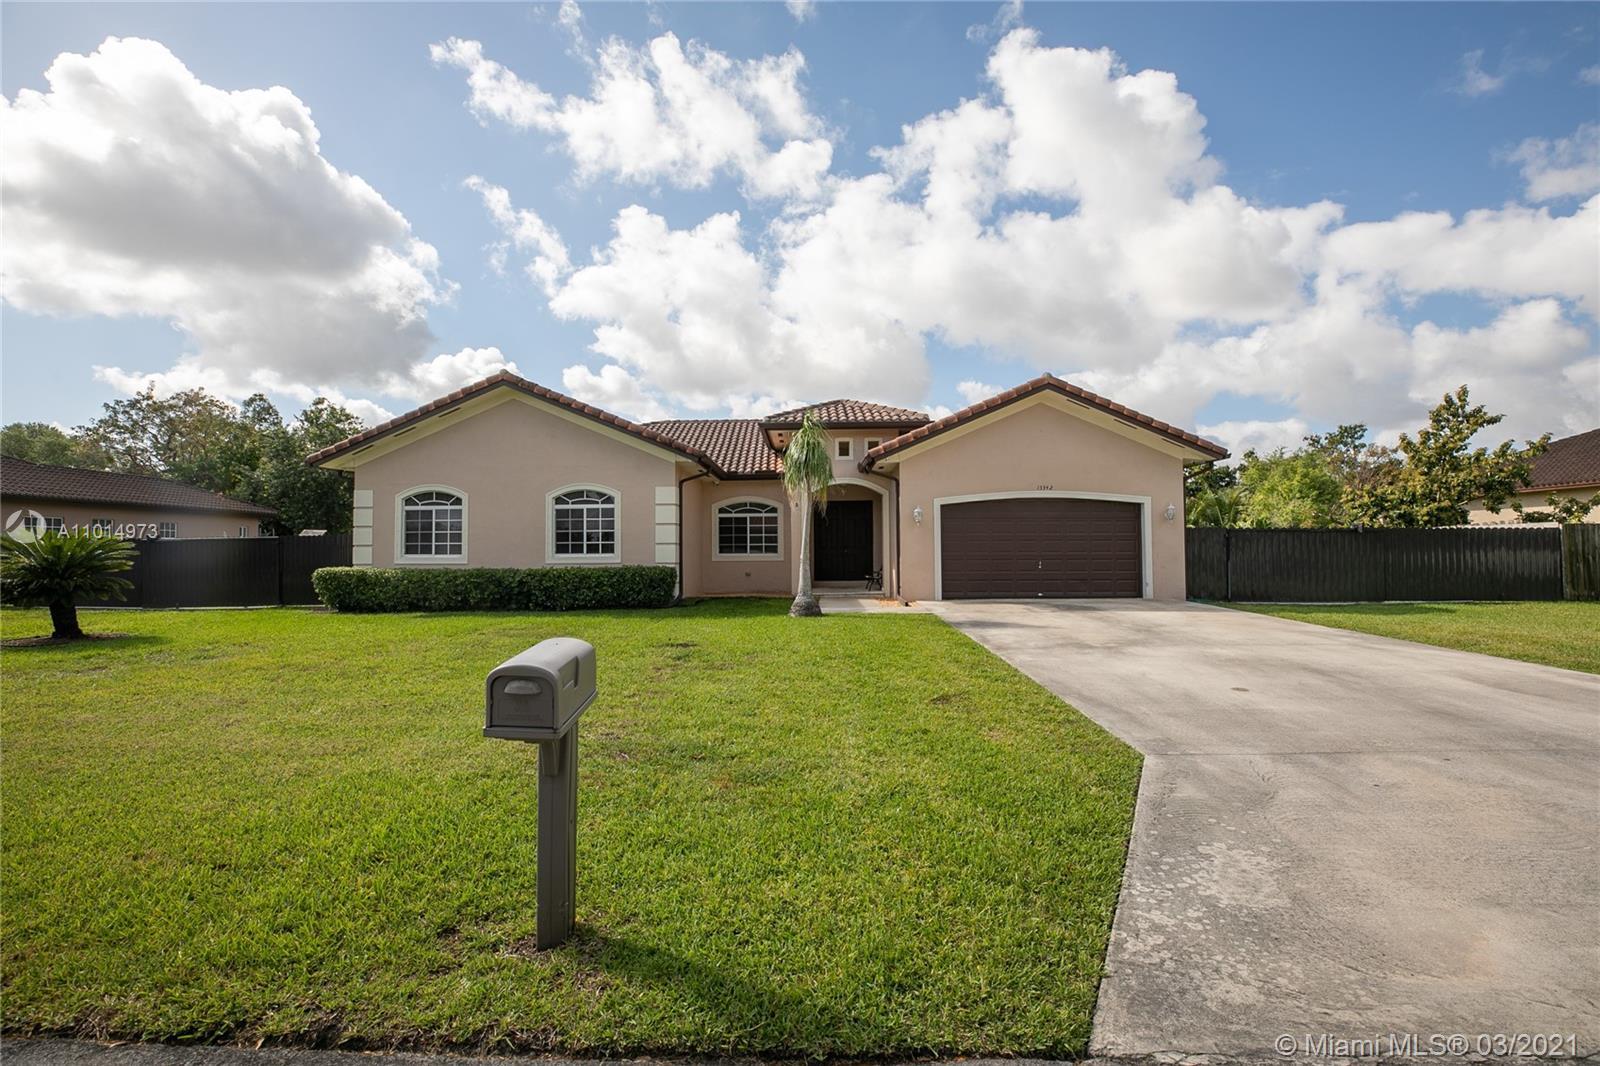 15342 Sw 277 Terrace Property Photo